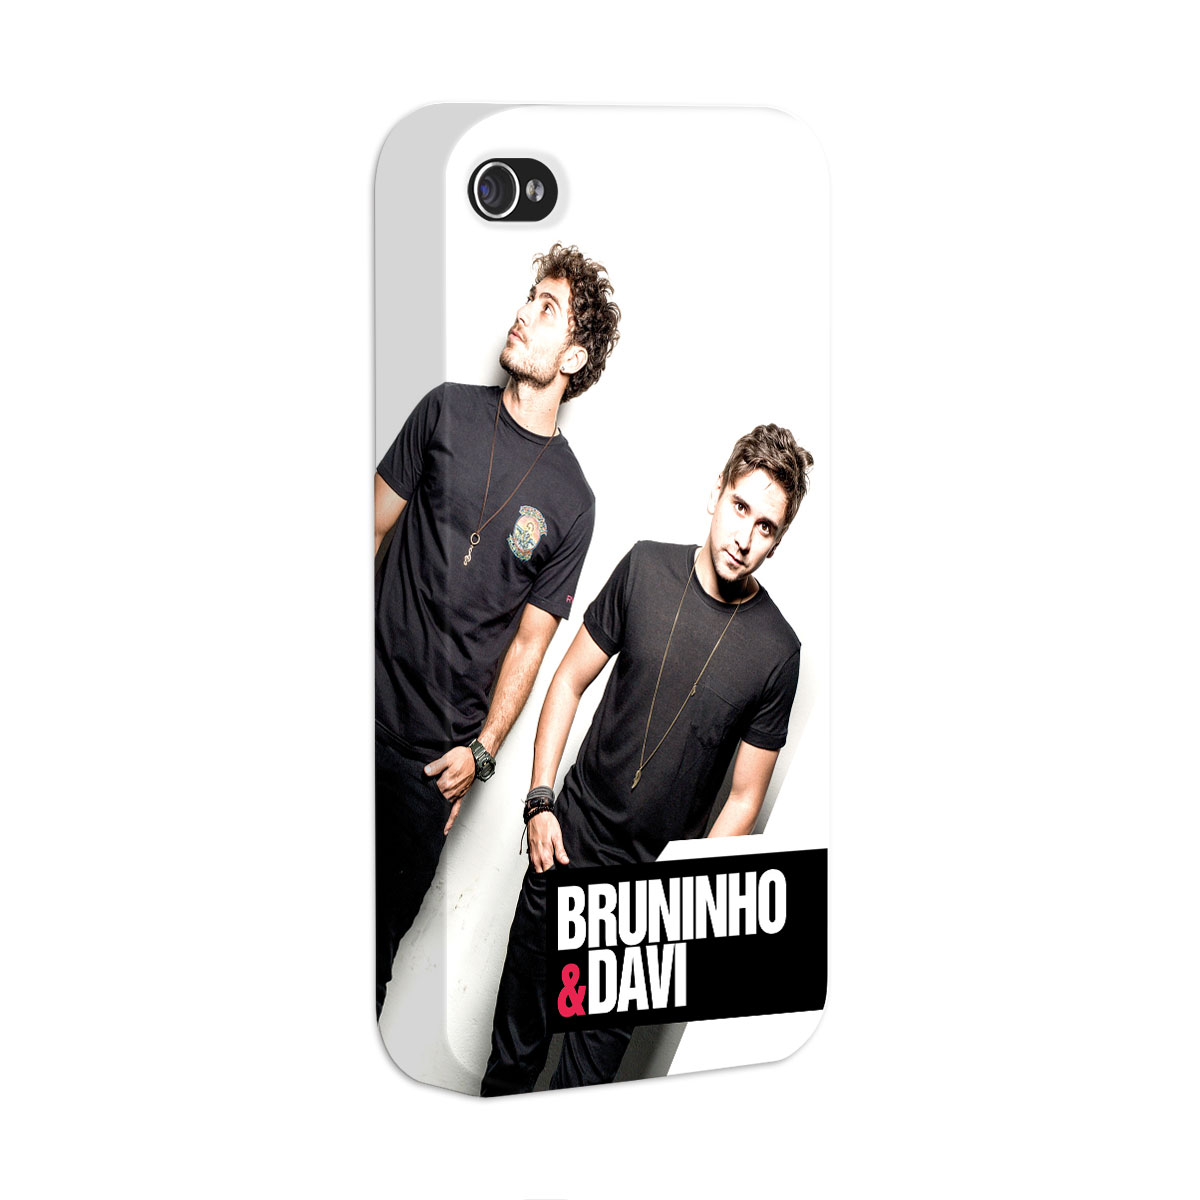 Capa para iPhone 4/4S Bruninho & Davi Foto